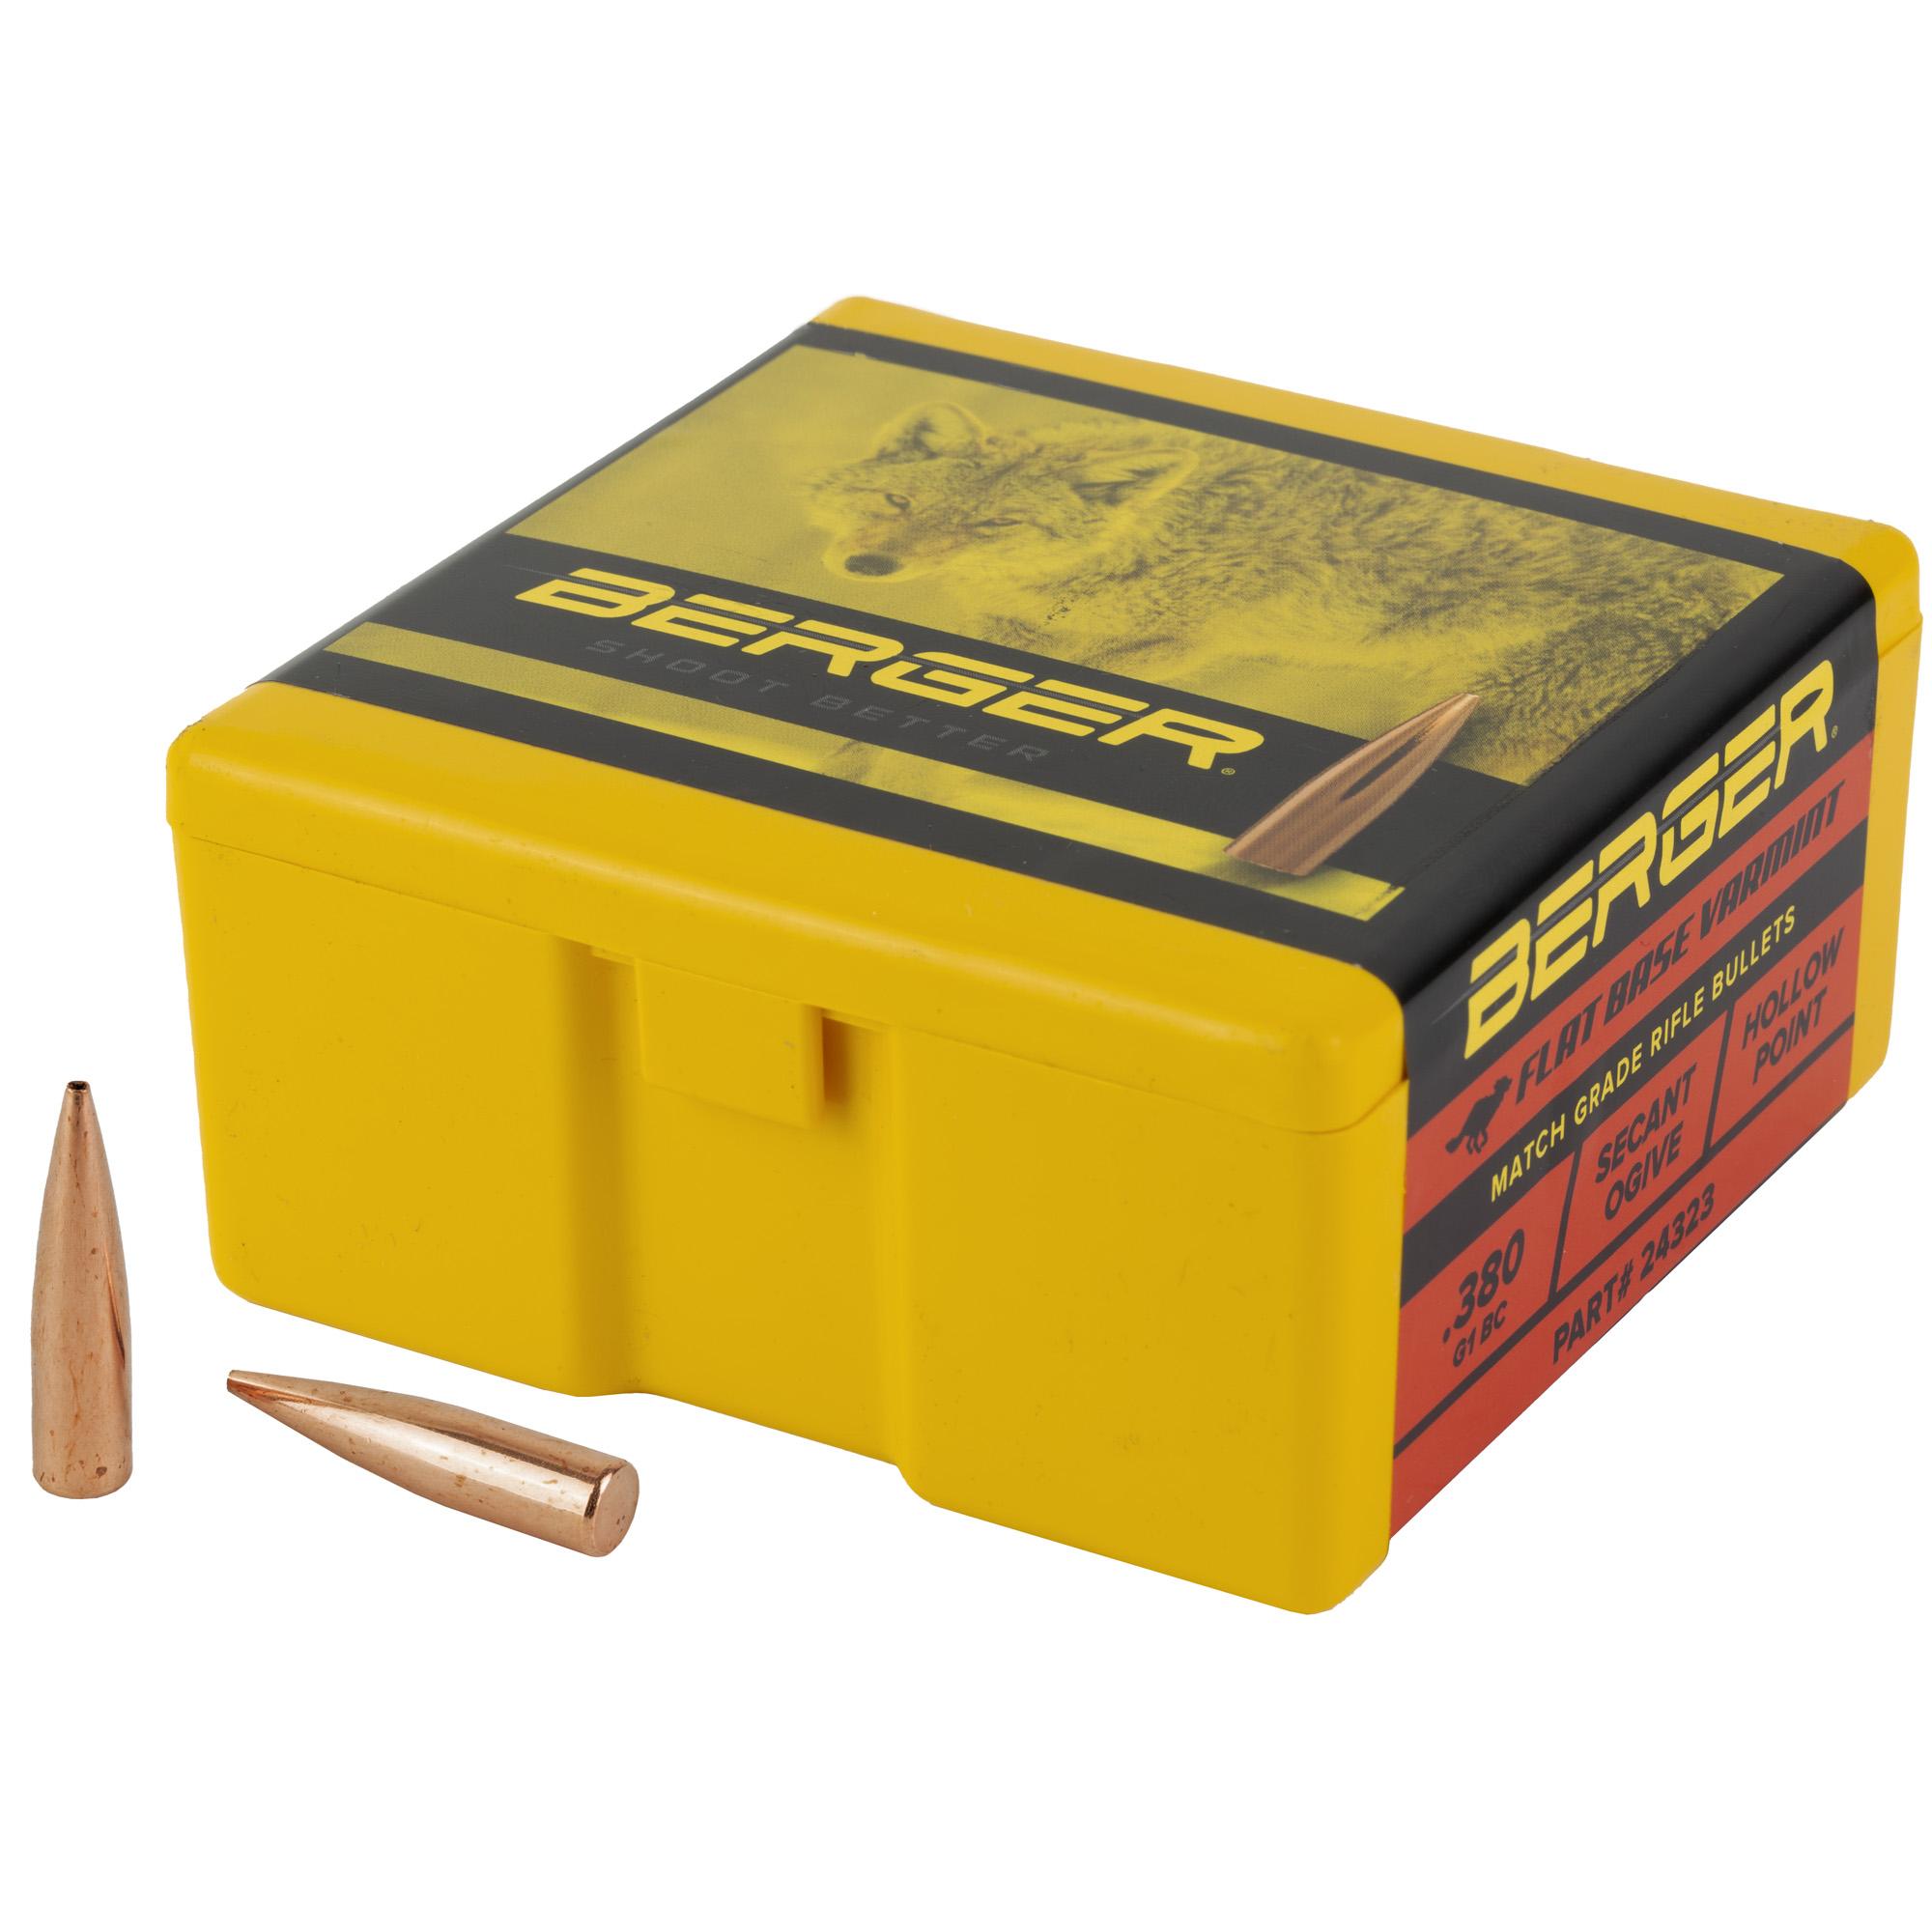 Berger 6mm 88gr Bc Varm Fb 100ct